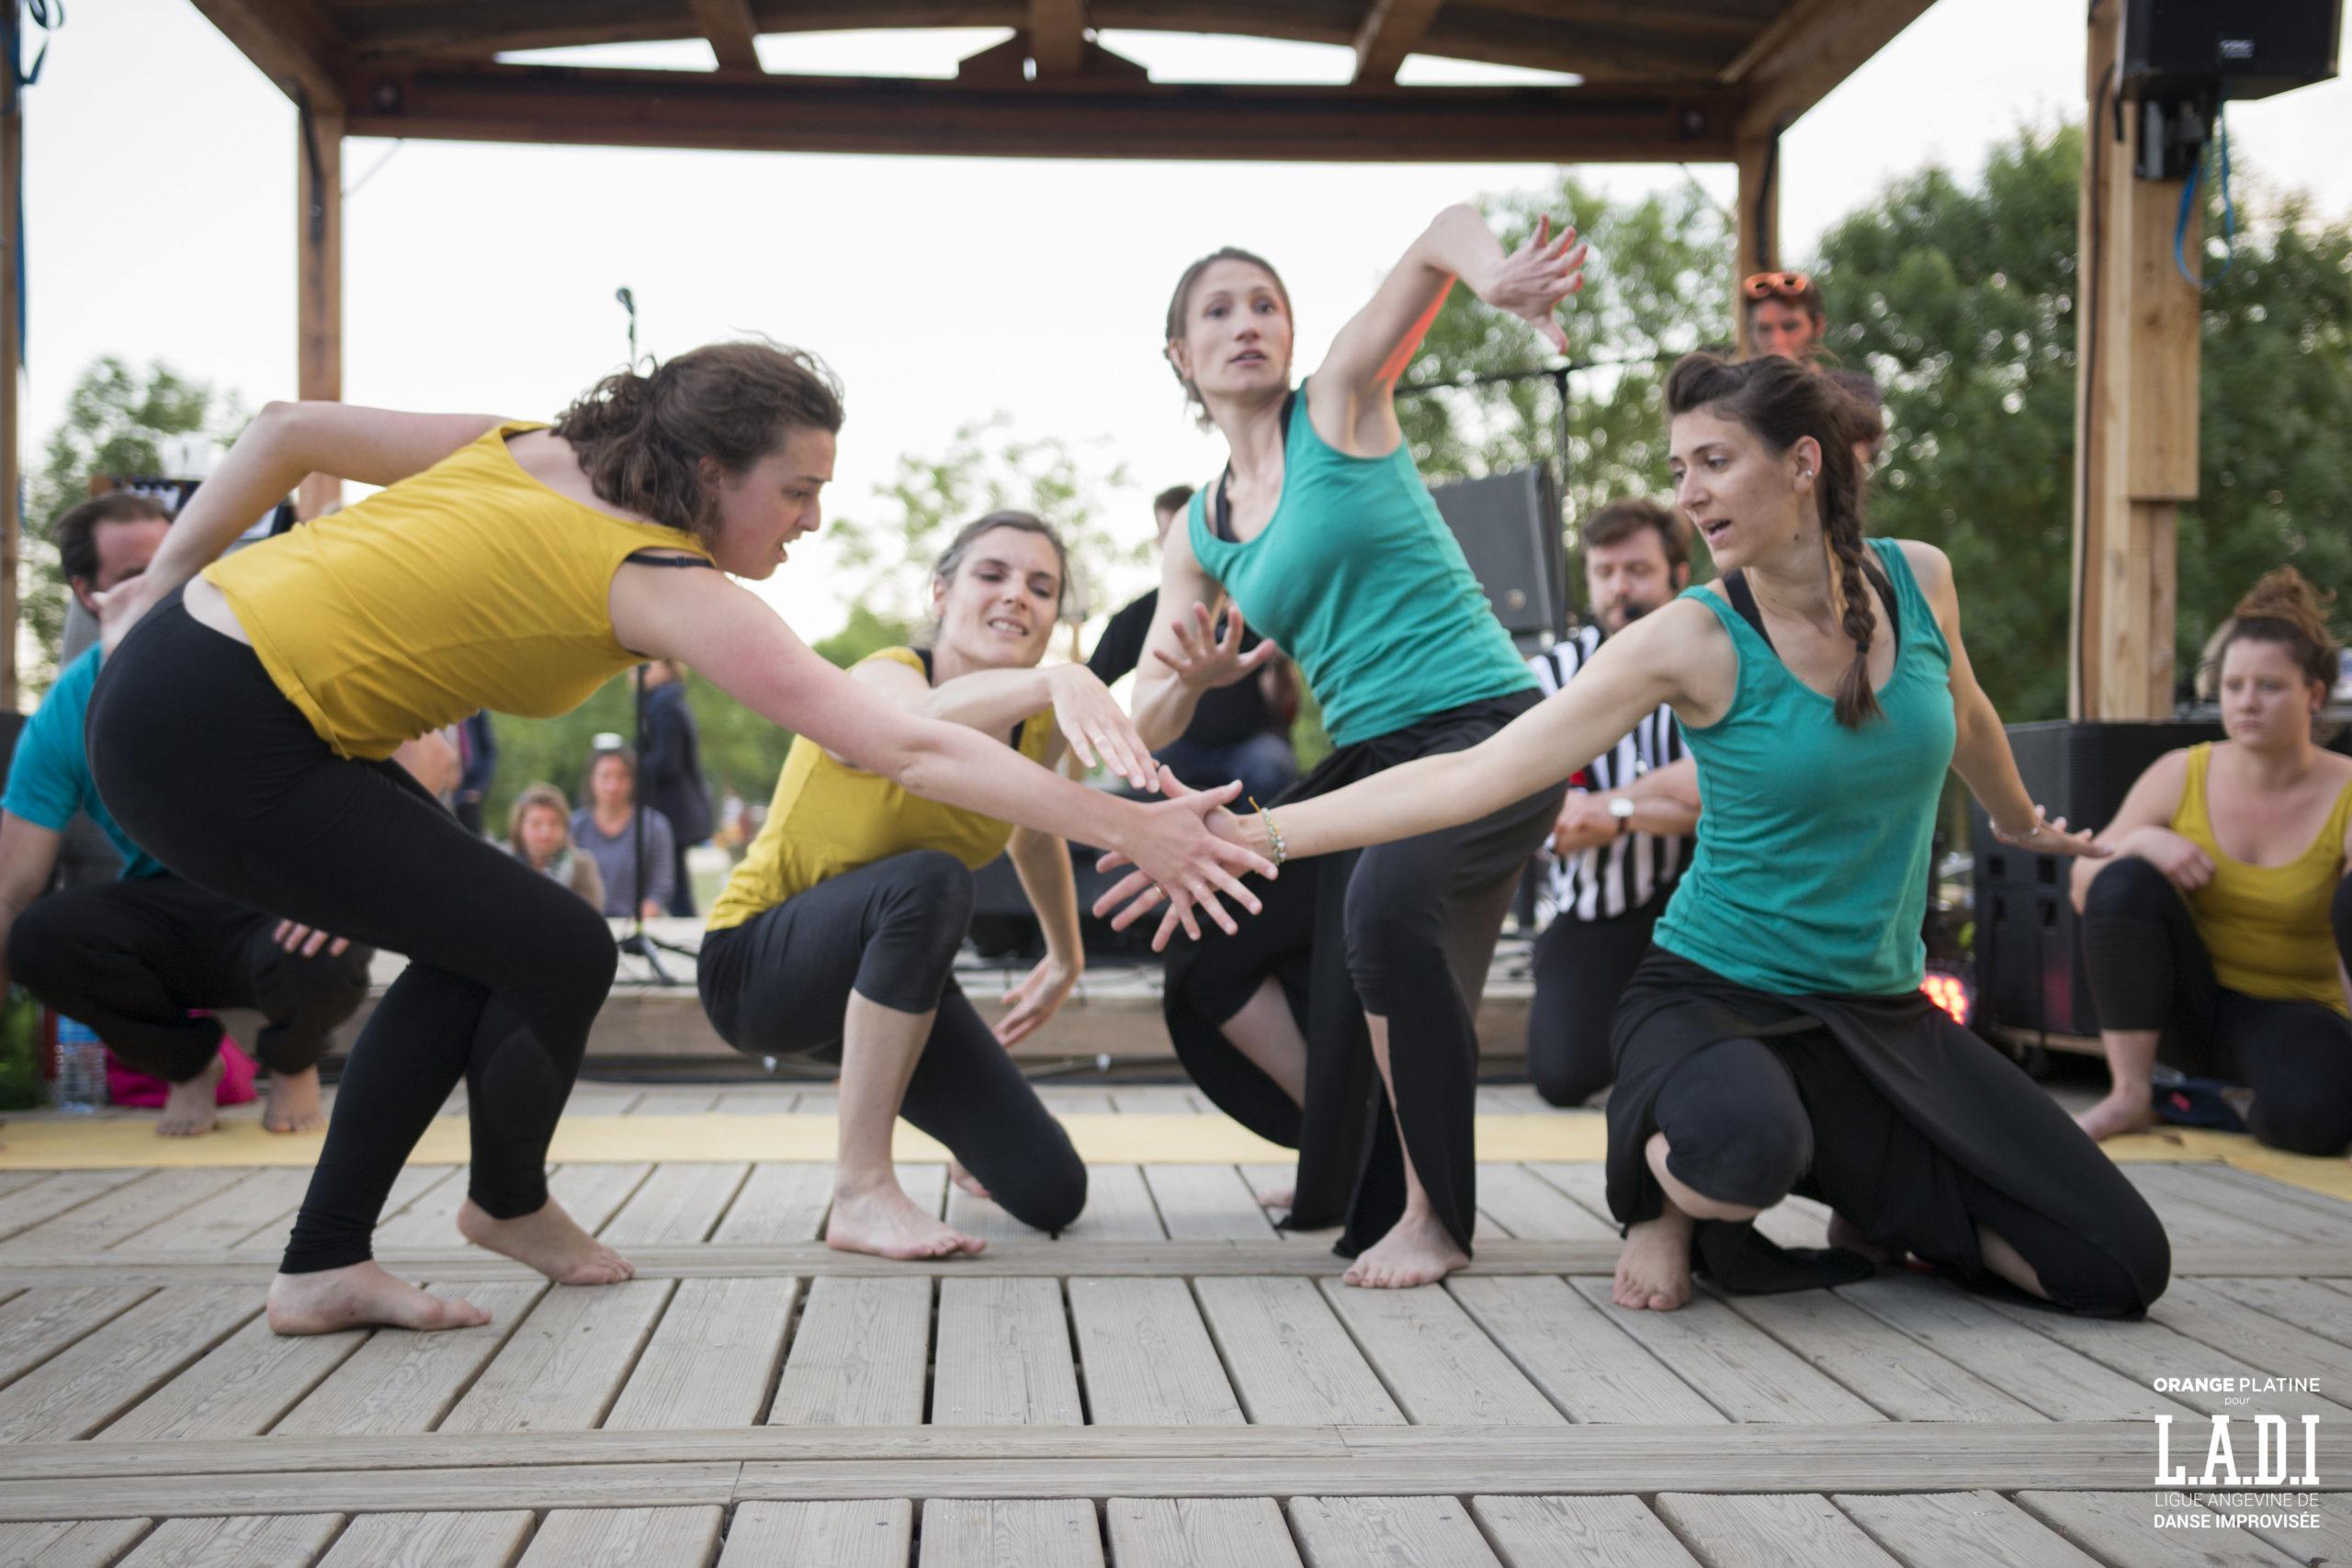 LADI - Ligue Angevine de Danse Improvisée